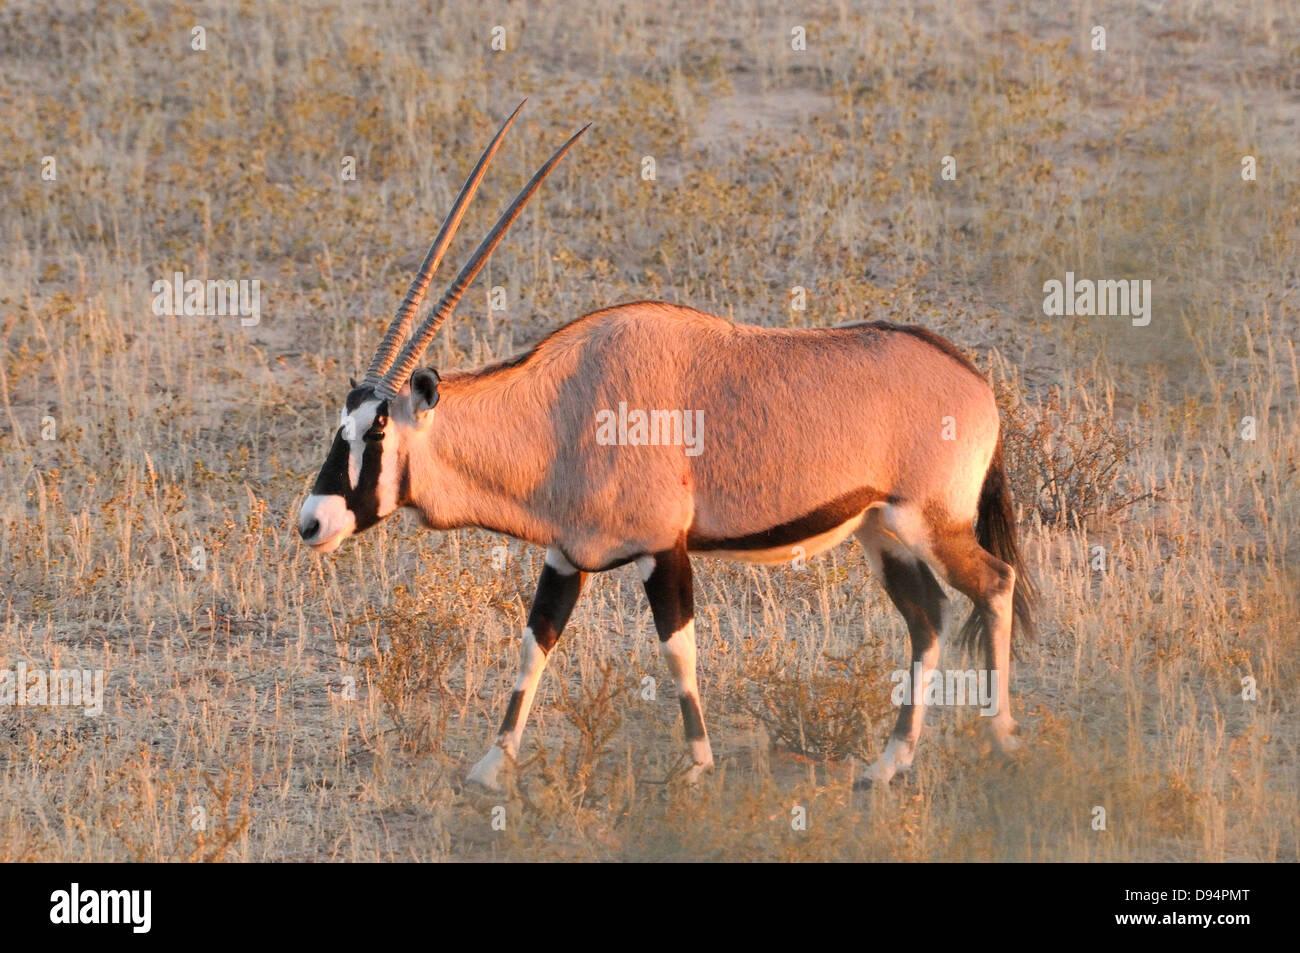 Southern Oryx ,(Gemsbok) Oryx gazella, Photographed in Kgalagadi National Park, South Africa - Stock Image